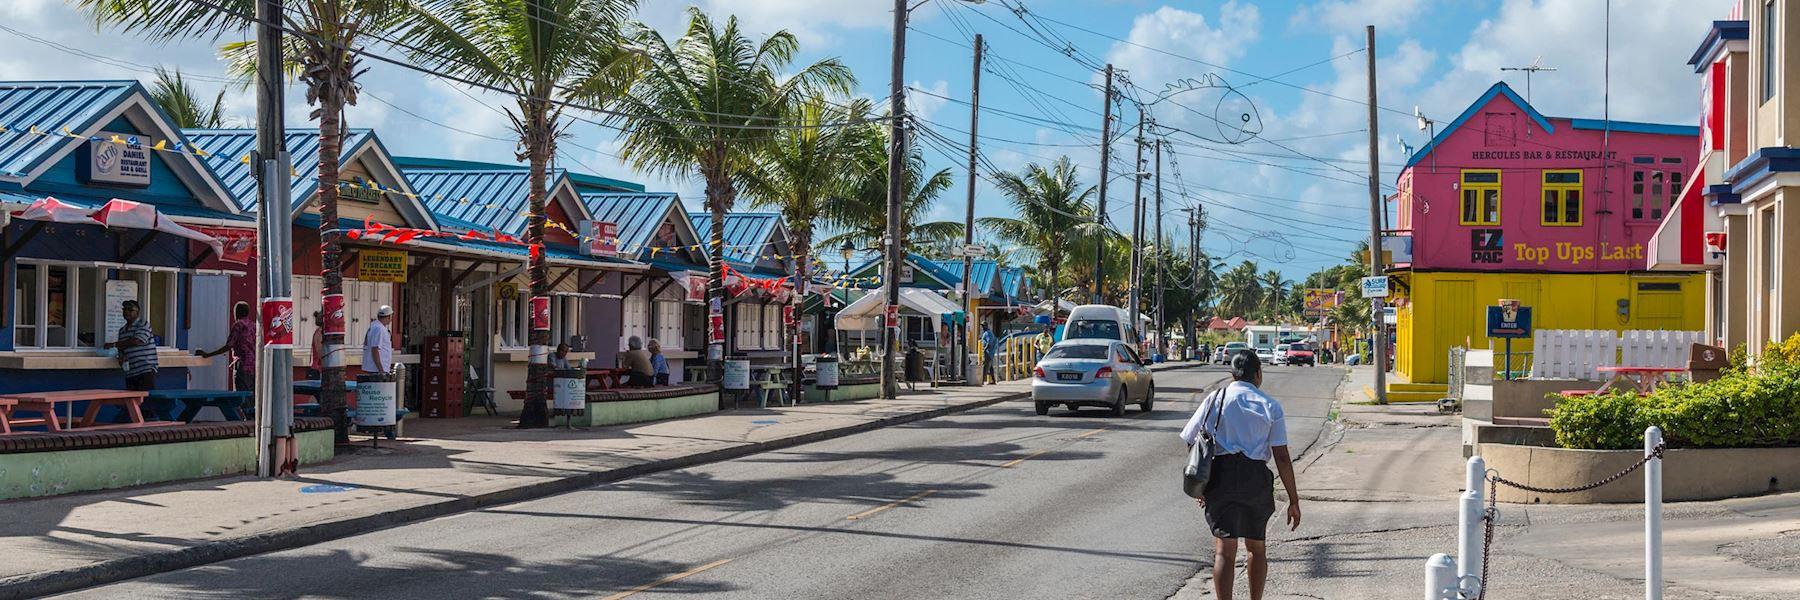 Visit Oistins, Barbados